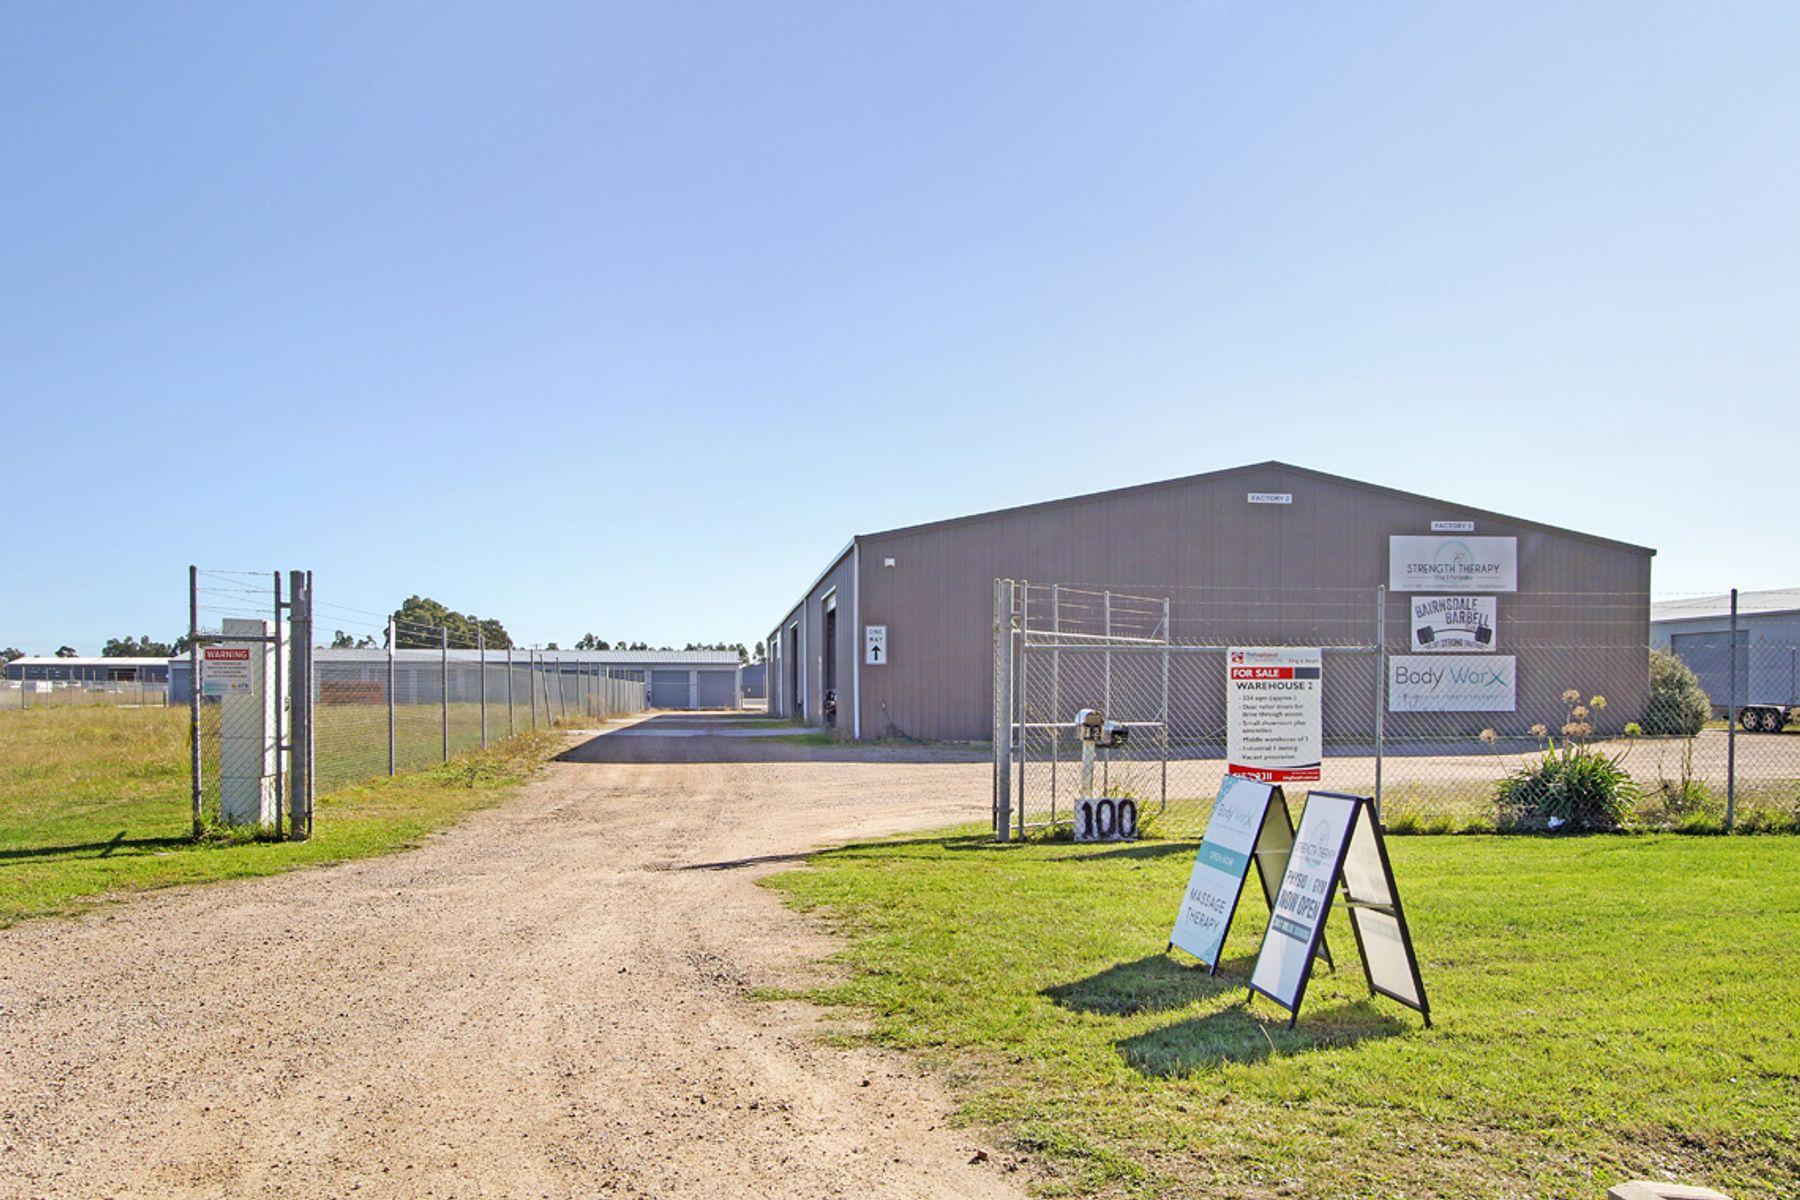 2/100 Forge Creek Road, Bairnsdale, VIC 3875